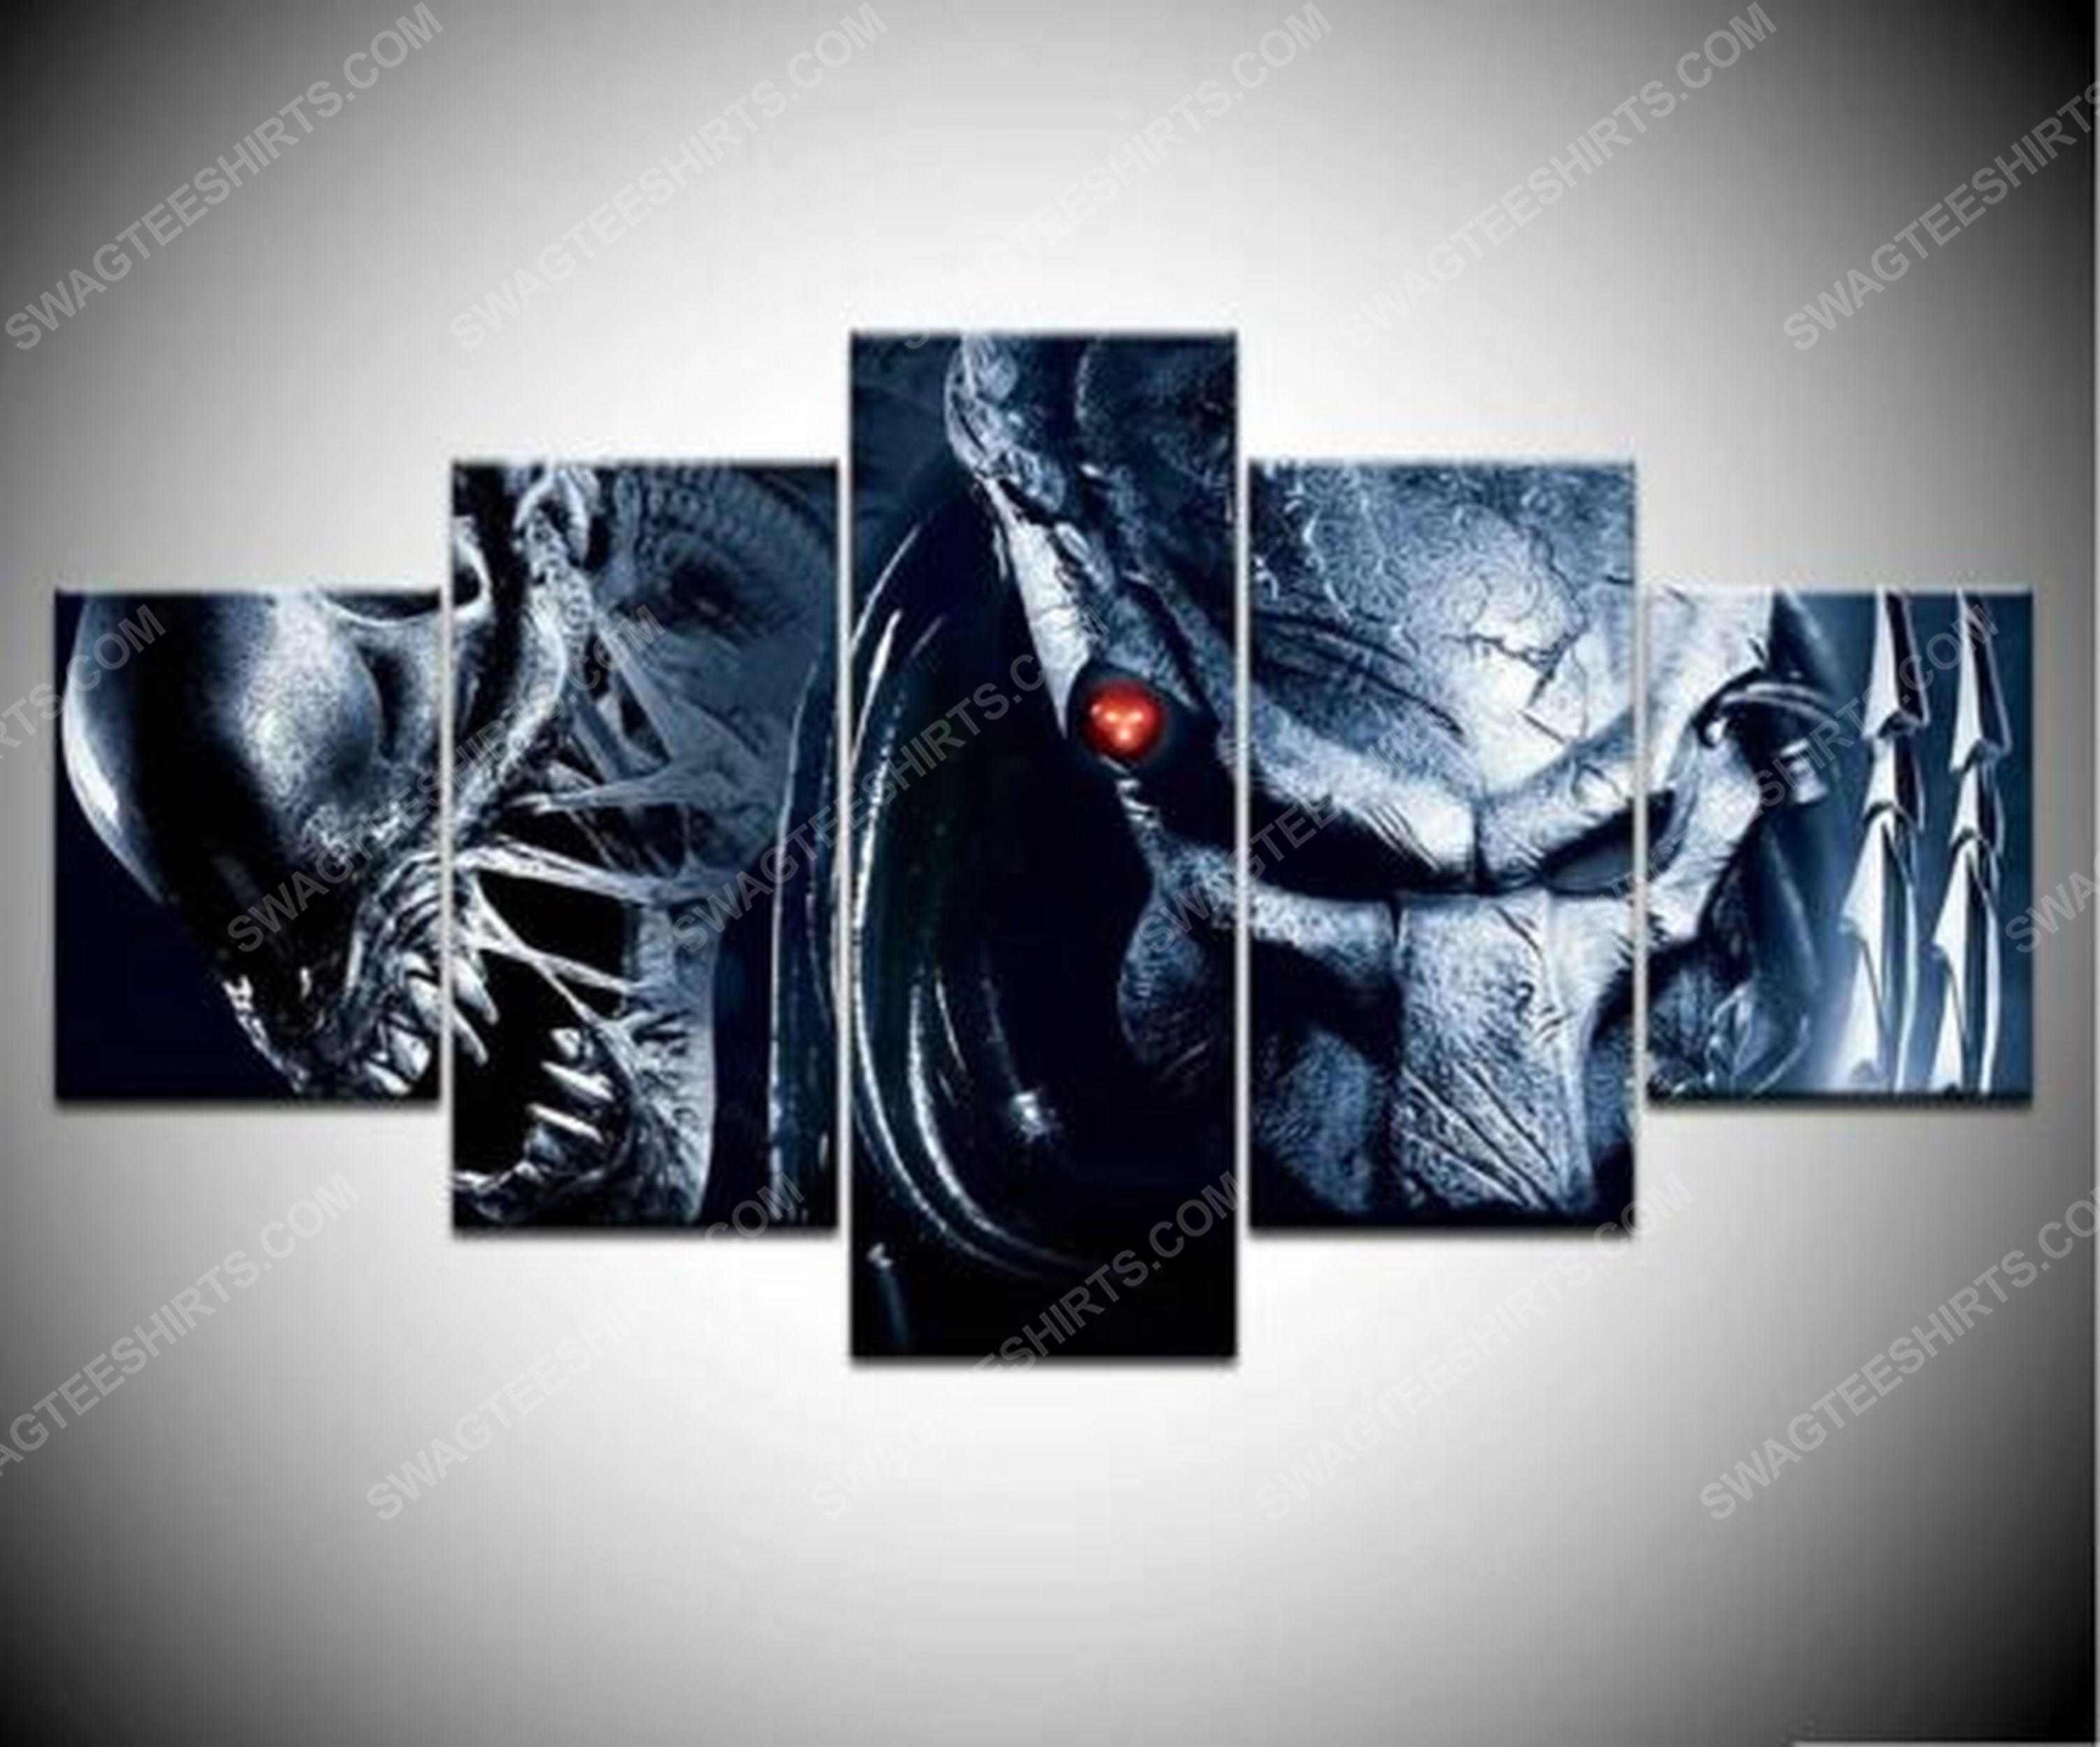 Alien and predator print painting canvas wall art home decor